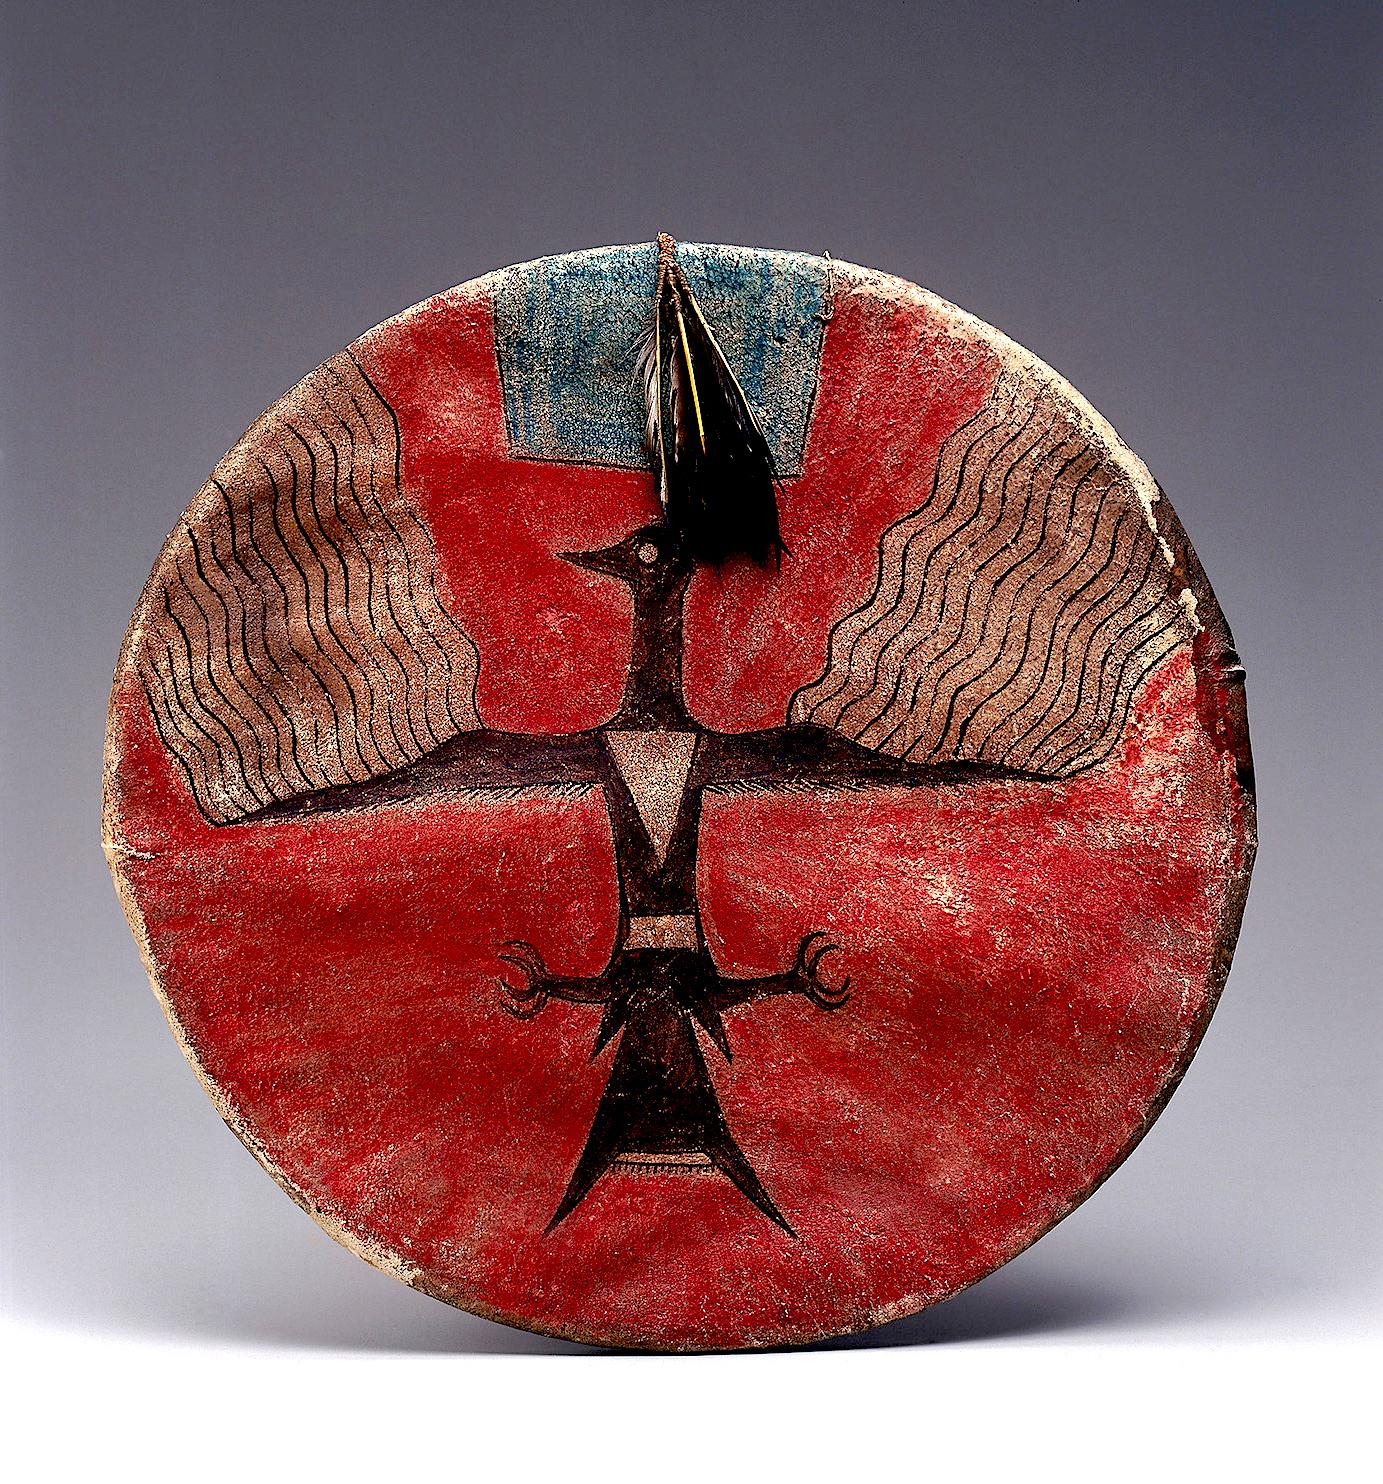 Metropolitan Museum of Art, The MET, New York Museum, Native American Art, Native American History, KOLUMN Magazine, KOLUMN